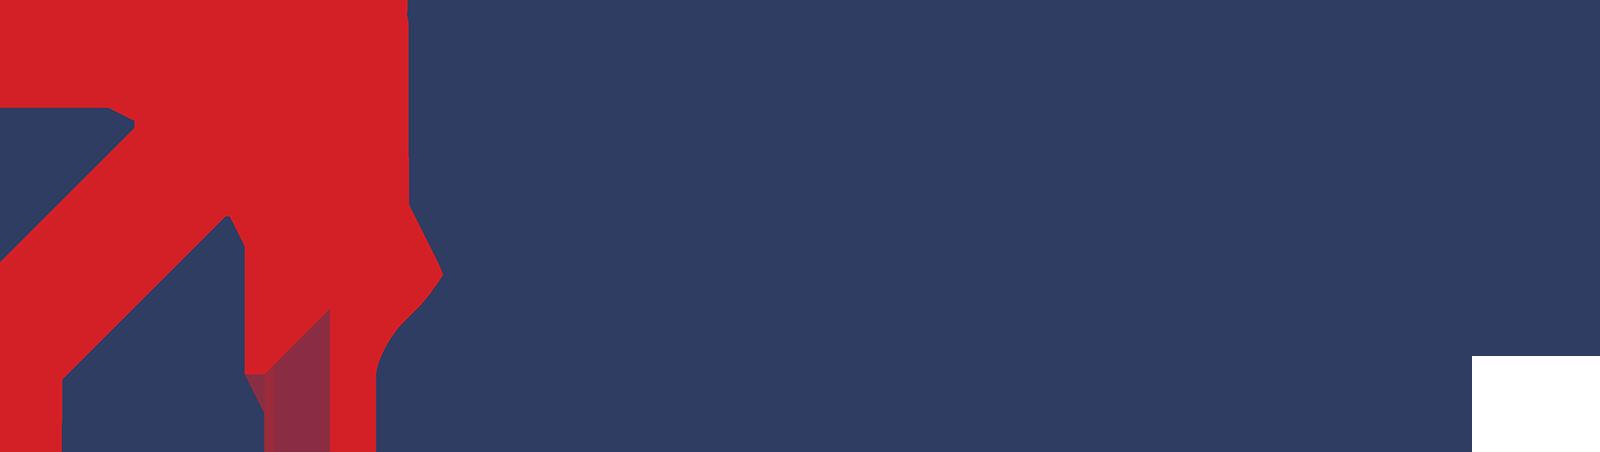 Member CyberExchange